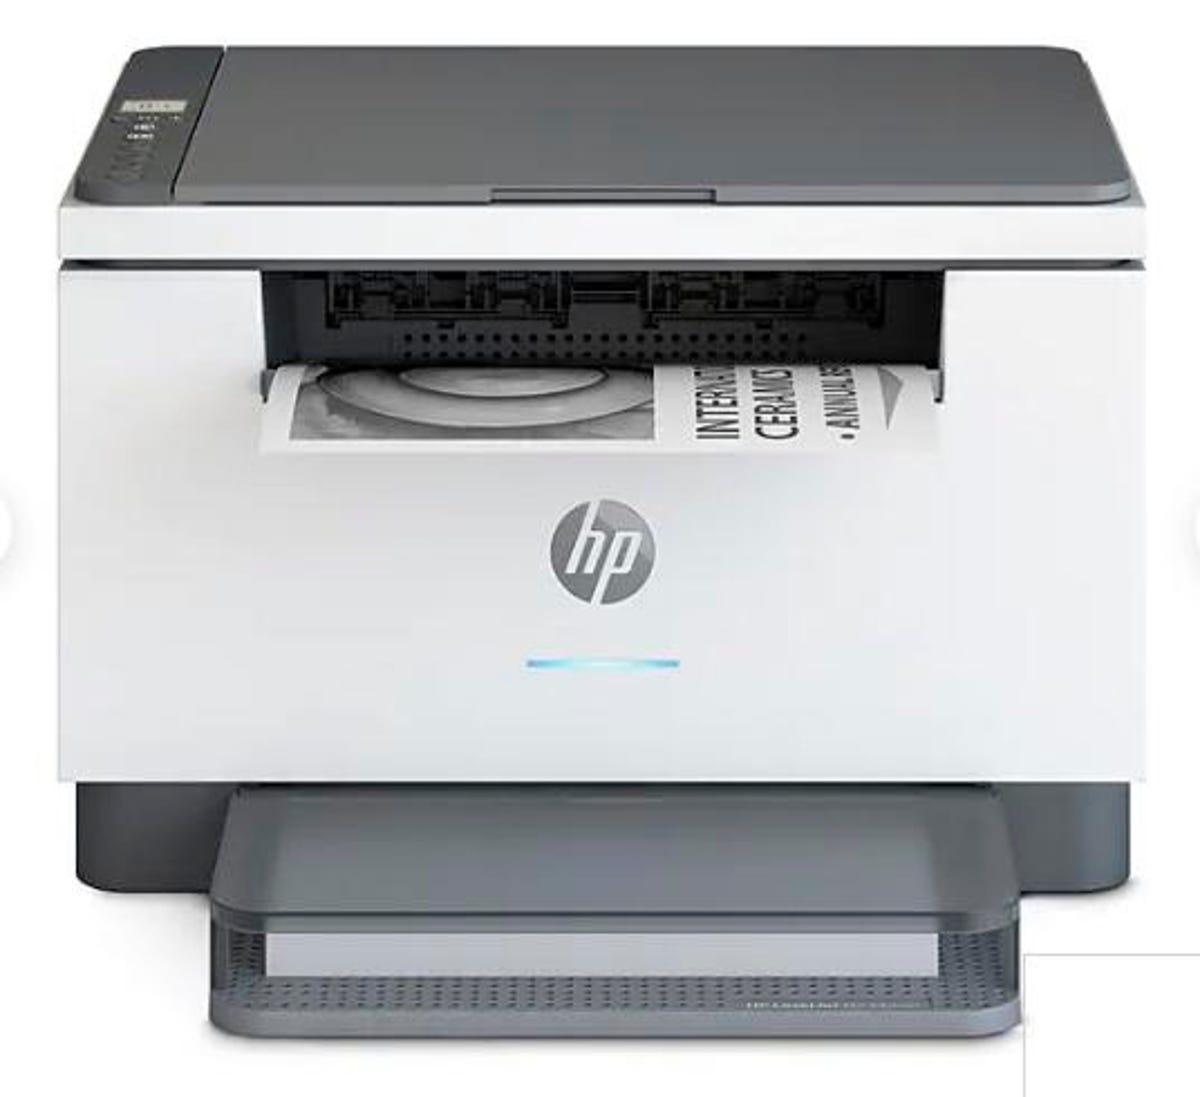 hp-laserjet-mfp-m234dwe-wireless-black-white-all-in-one-printer-w-6-months-free-toner-through-hp-plus-6gw99e-staples-2021-03-24-20-38-31.jpg